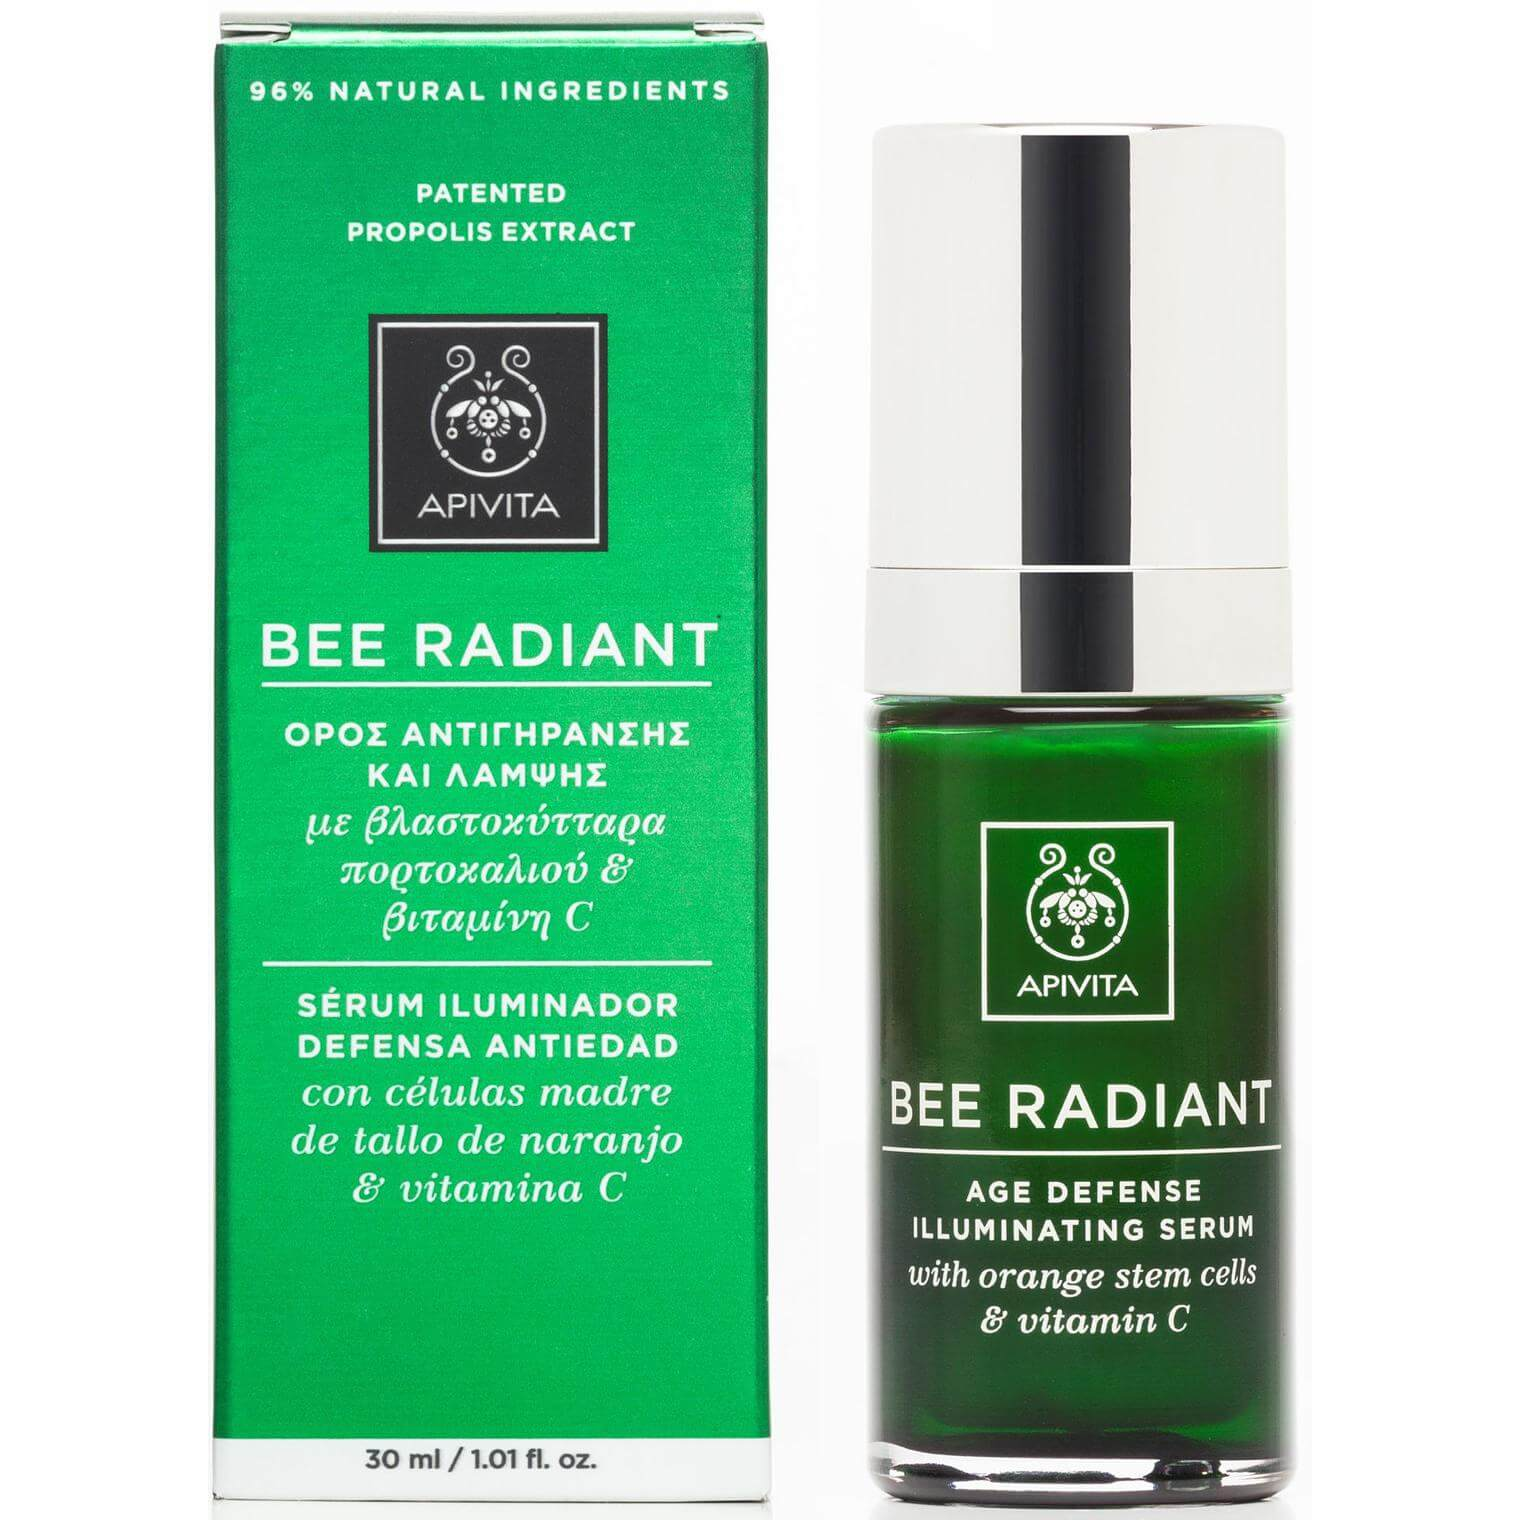 Apivita Bee Radiant Serum Ορός Αντιγήρανσης & Λάμψης με Βλαστοκύτταρα Πορτοκαλιού & Βιταμίνη C 30ml